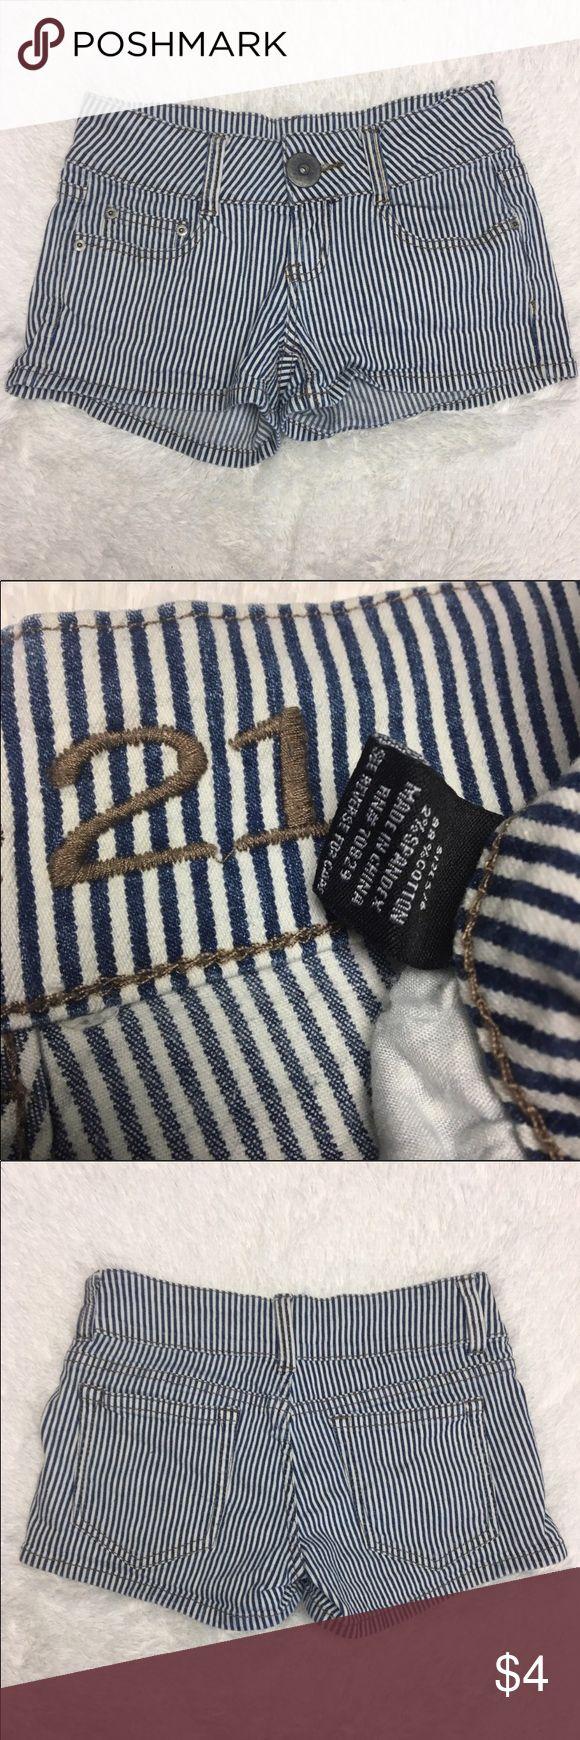 ✖️Last Days✖️Rue21 Train Conductor Denim Shorts Rue21 Train Conductor Pinstriped Denim Shorts  Rue21 Train Conductor Pinstriped Denim Shorts. Juniors size 5/6 - excellent condition! Inventory: A Shorts